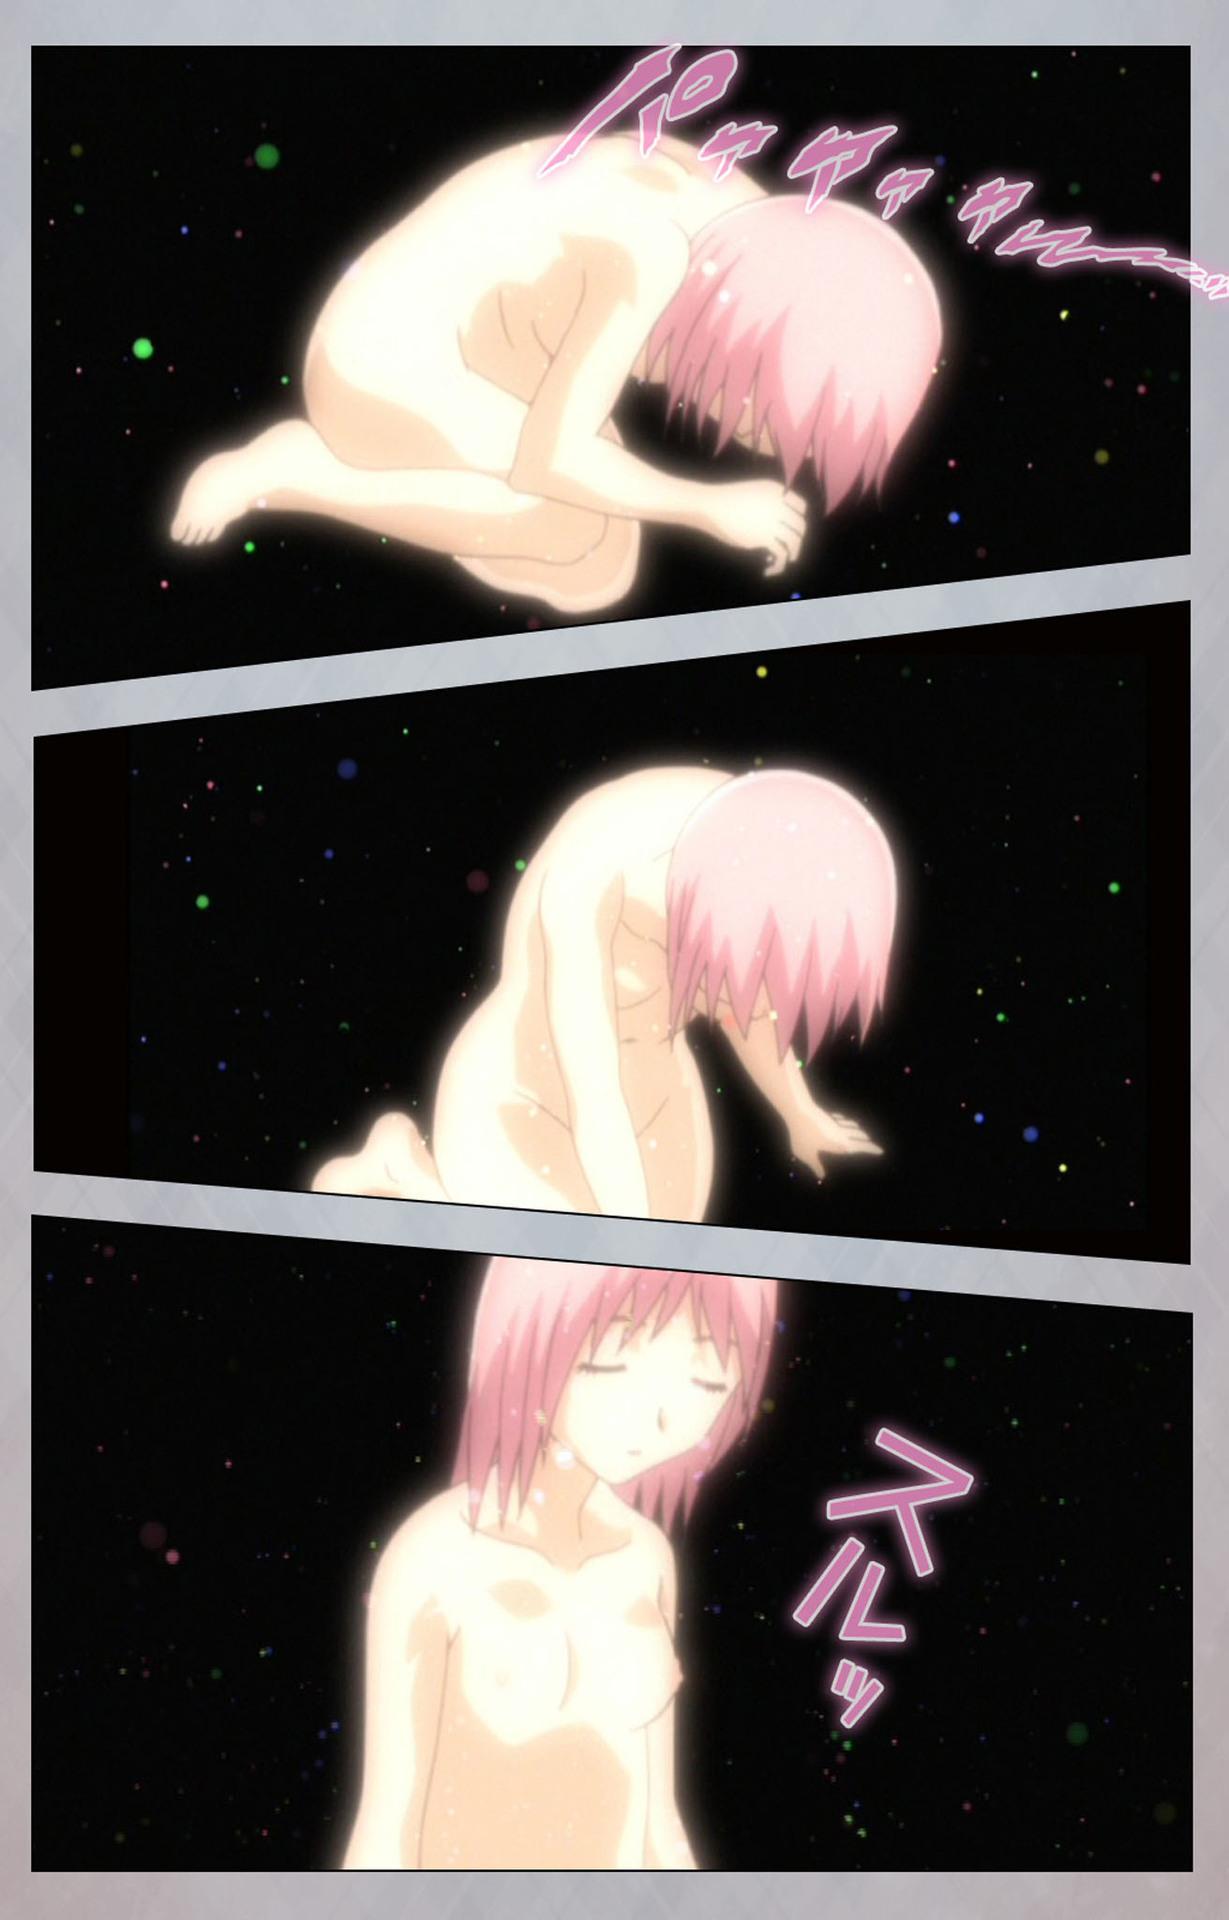 [Digital Works] [Full Color Seijin Ban] Sex Android ~Risou no Onna de Nuite yaru~ Kanzenban 28